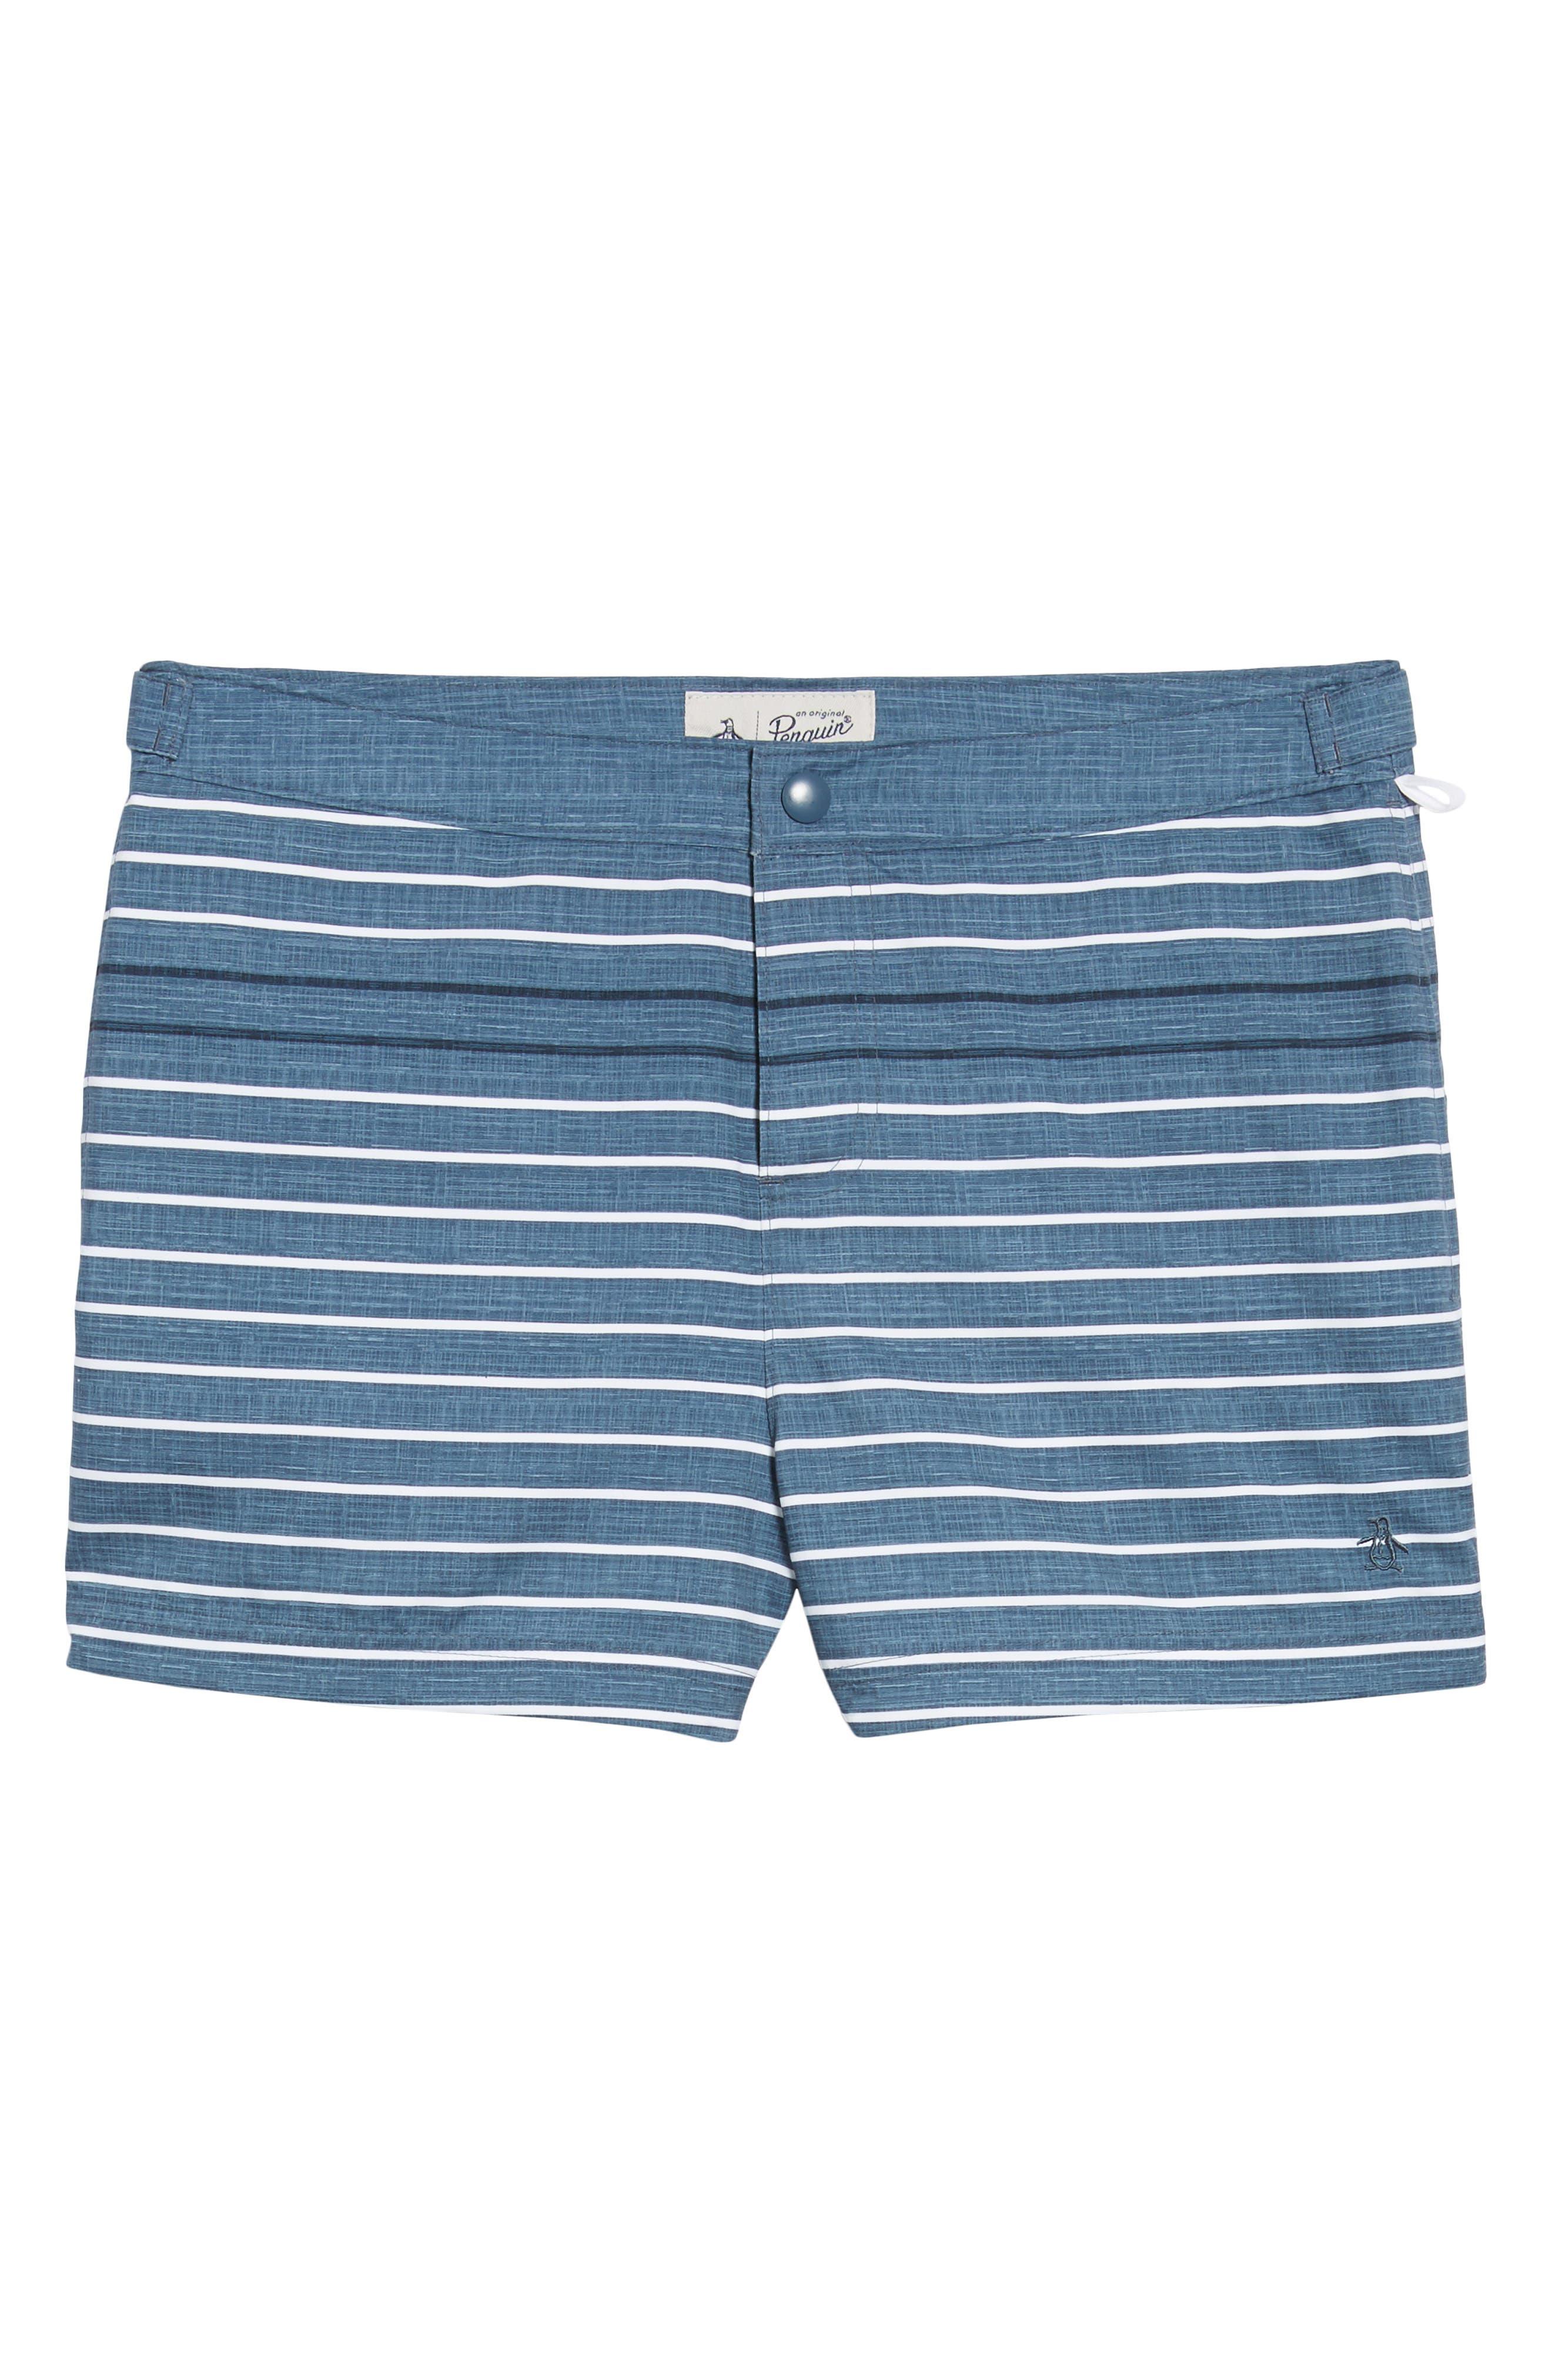 Feeder Stripe Board Shorts,                             Alternate thumbnail 6, color,                             Vintage Indigo